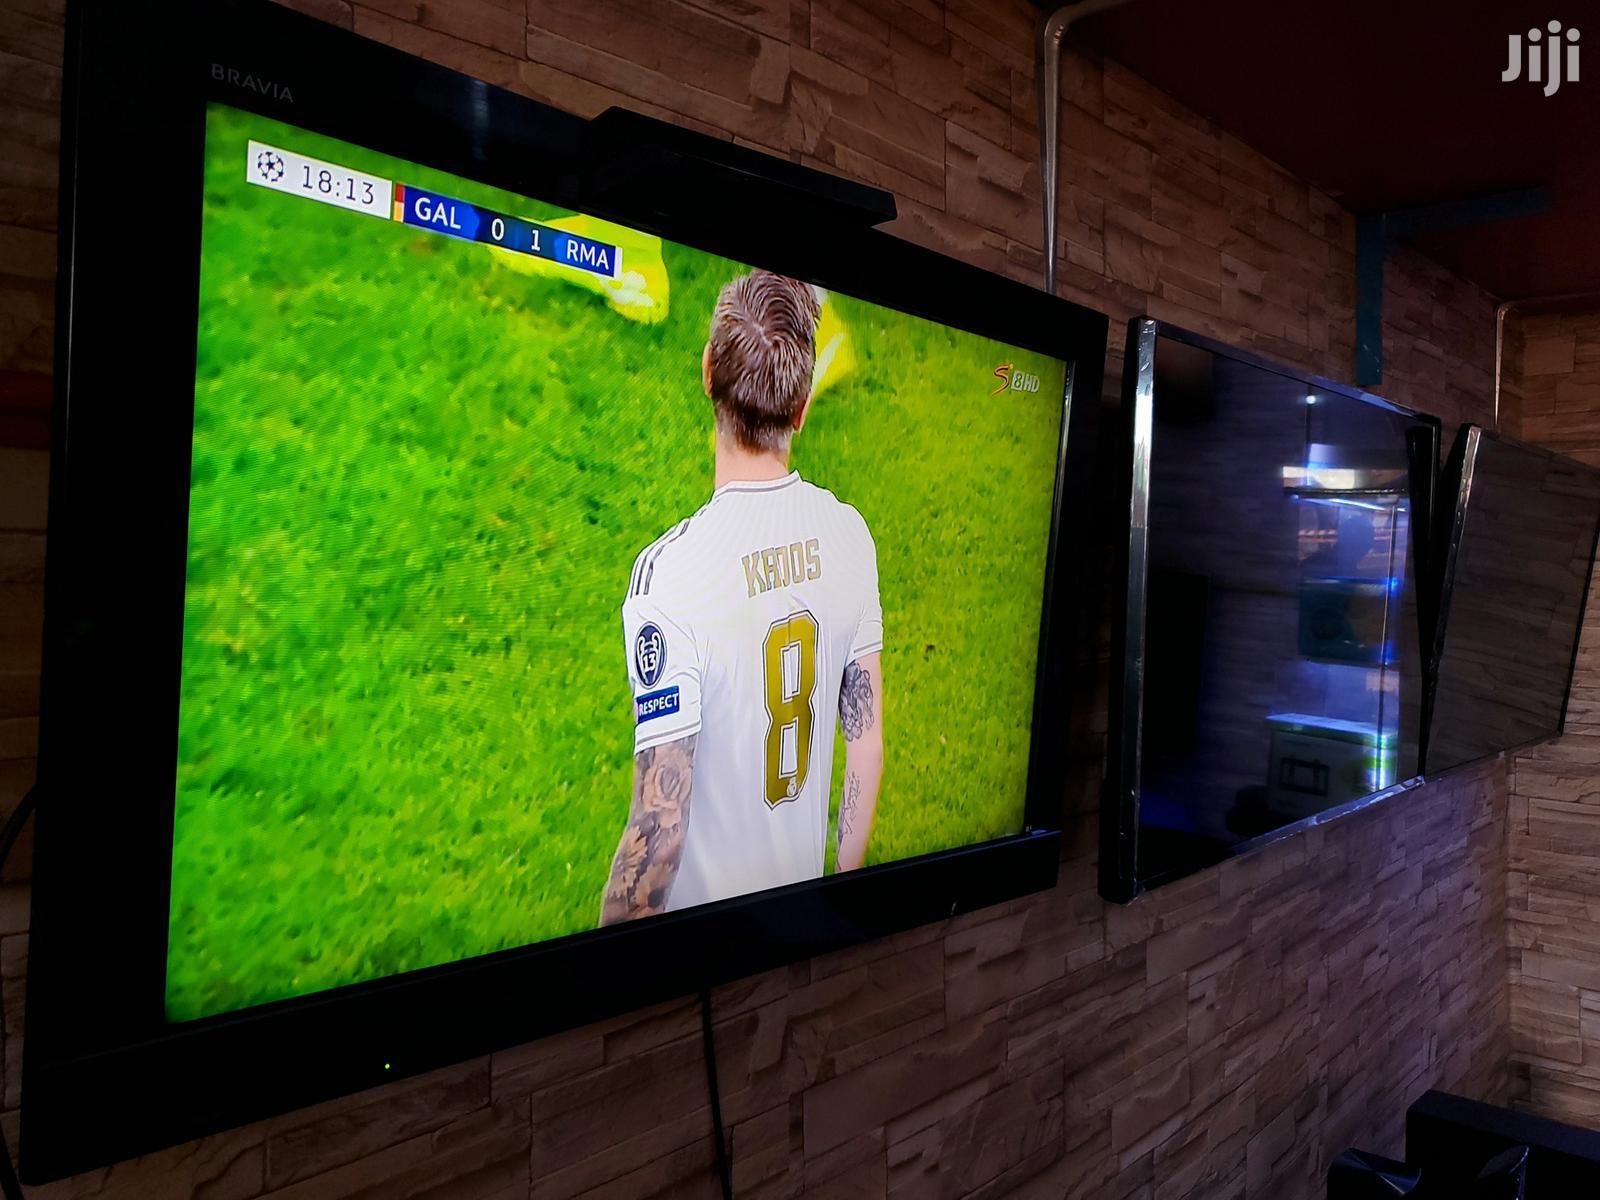 Sony Bravia Led Tv 32 Inches